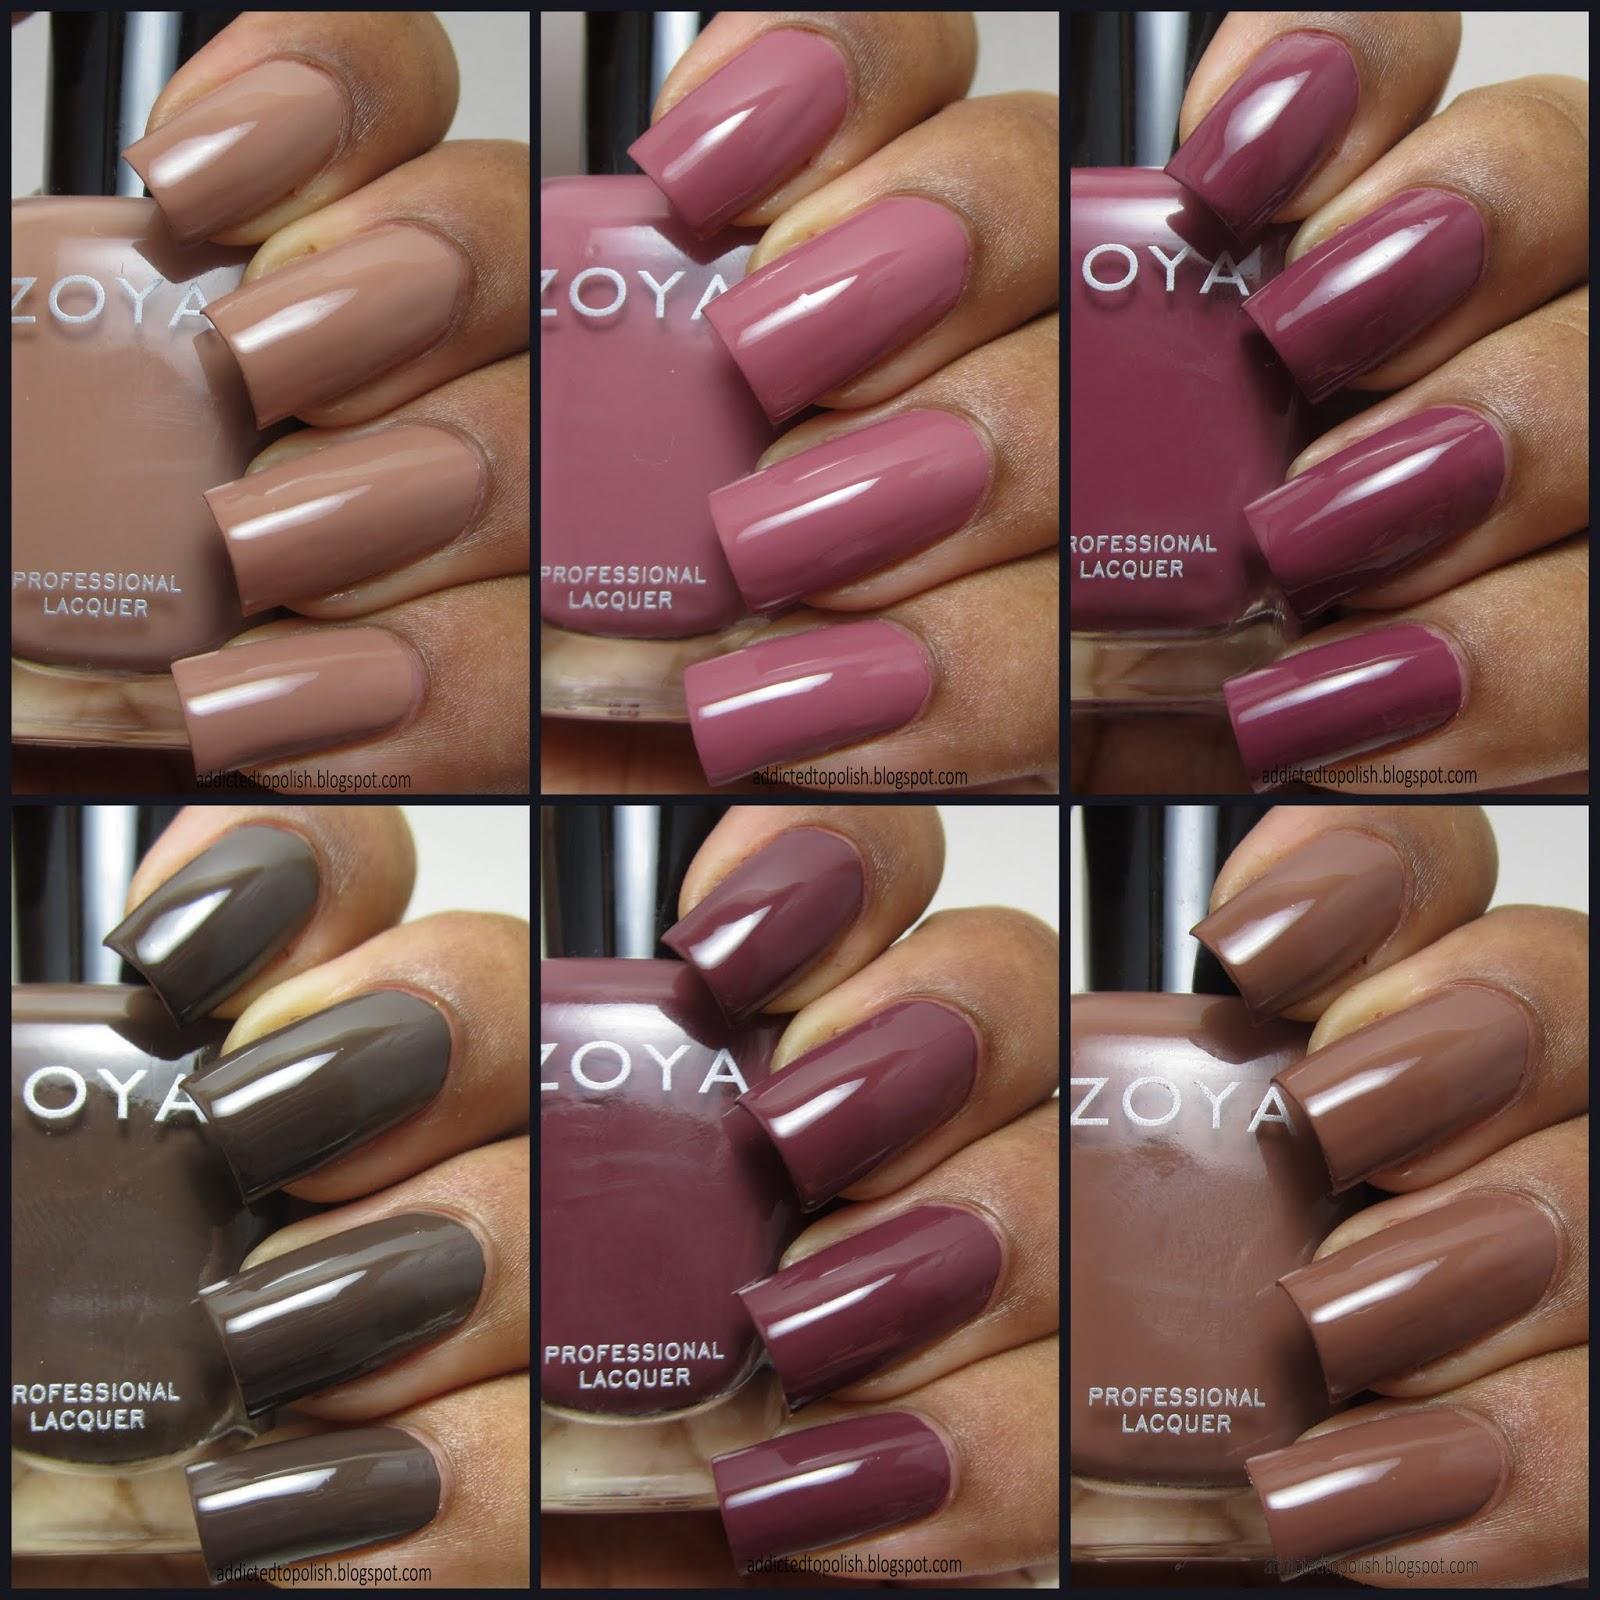 Zoya Neutral Nail Polish Swatches - Creative Touch